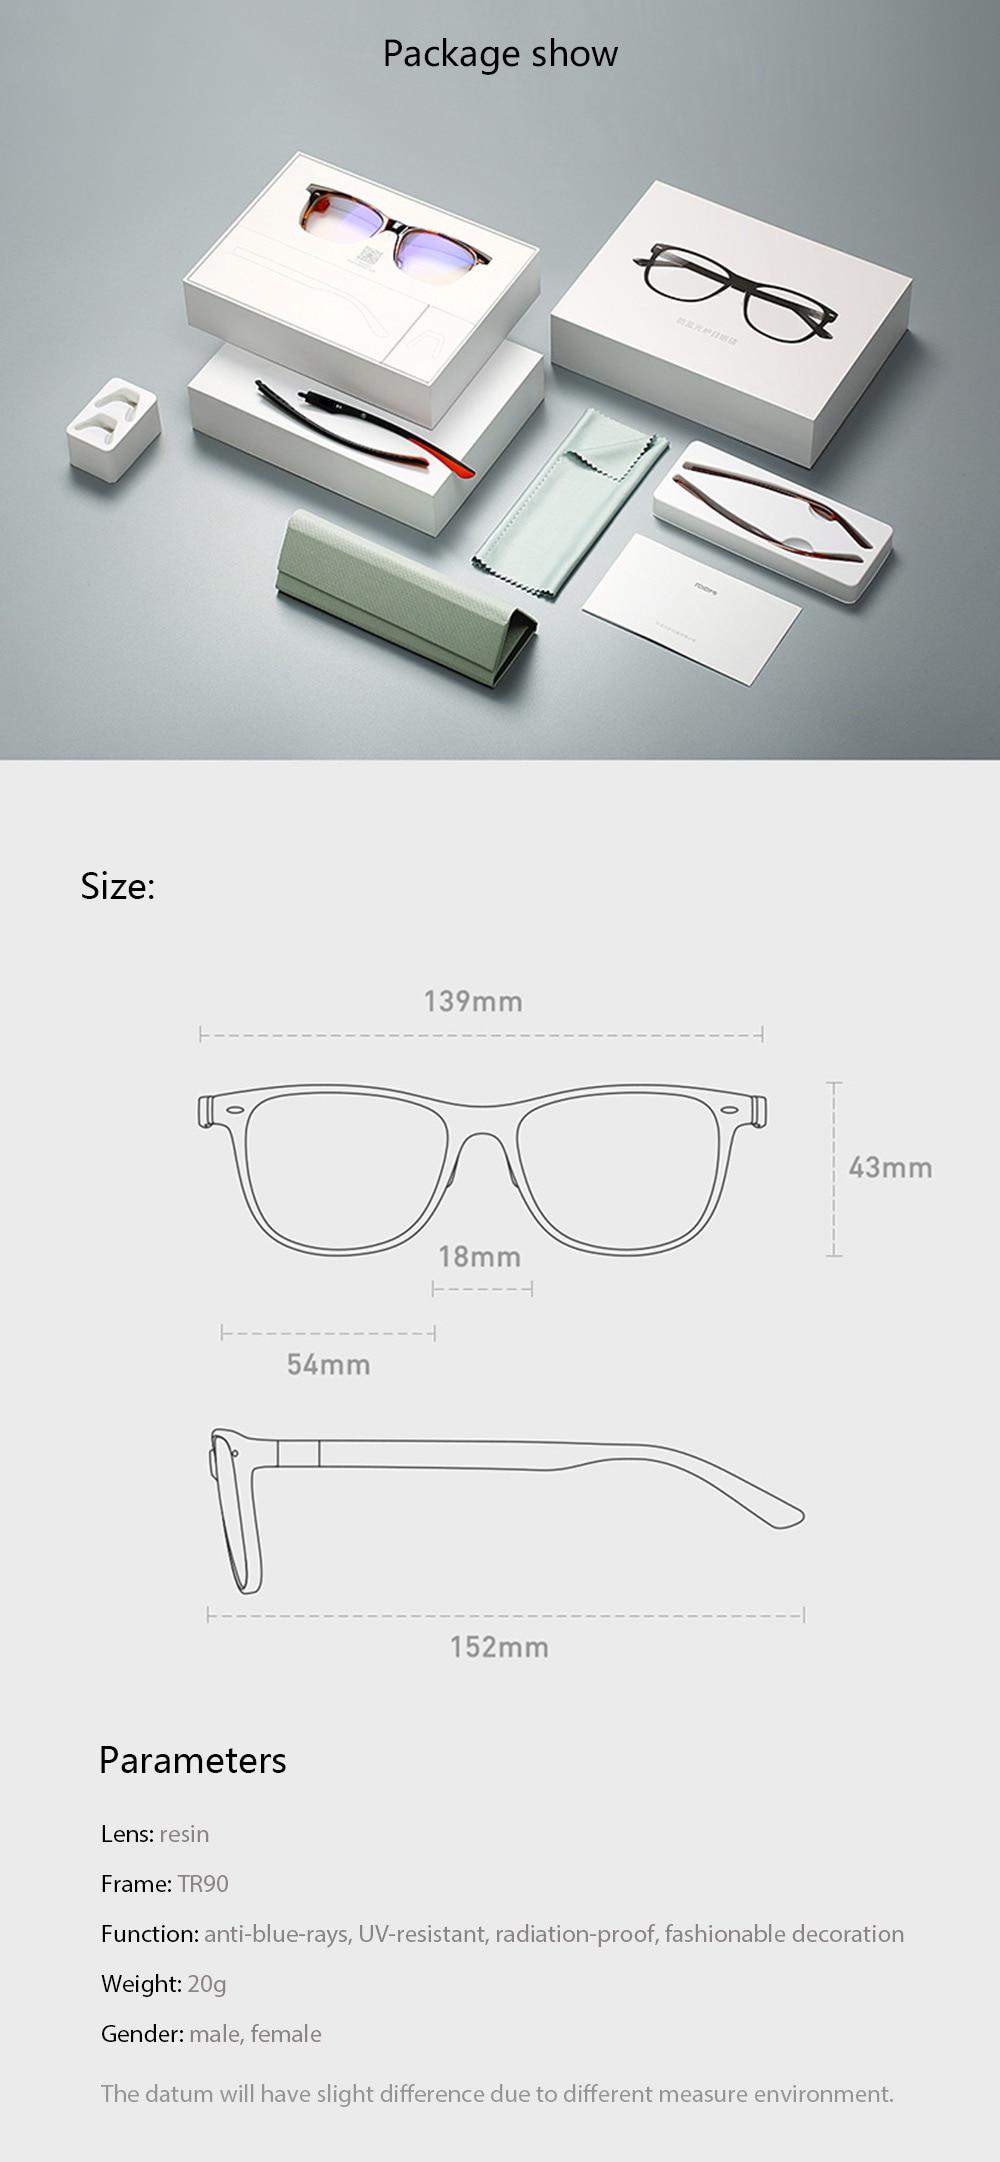 Original Xiaomi B1 ROIDMI Detachable Anti-blue-rays Protective Glasses Eye Protector For Man Woman Play Phone/Computer/Games